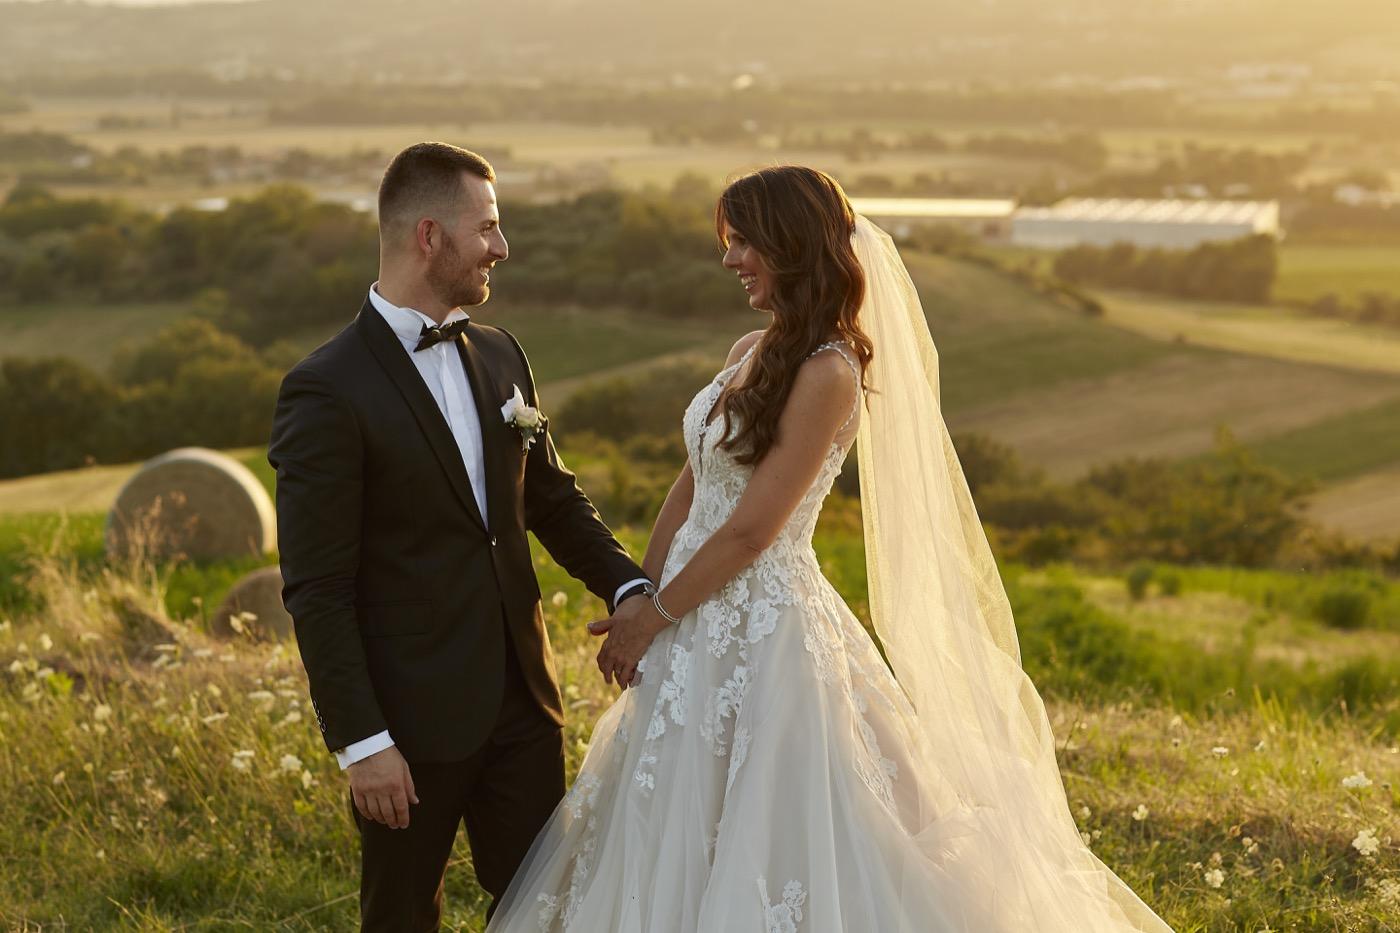 Claudio-Coppola-wedding-photographer-la-scuderia-eventi-preparativi-la-rosetta-perugia-76